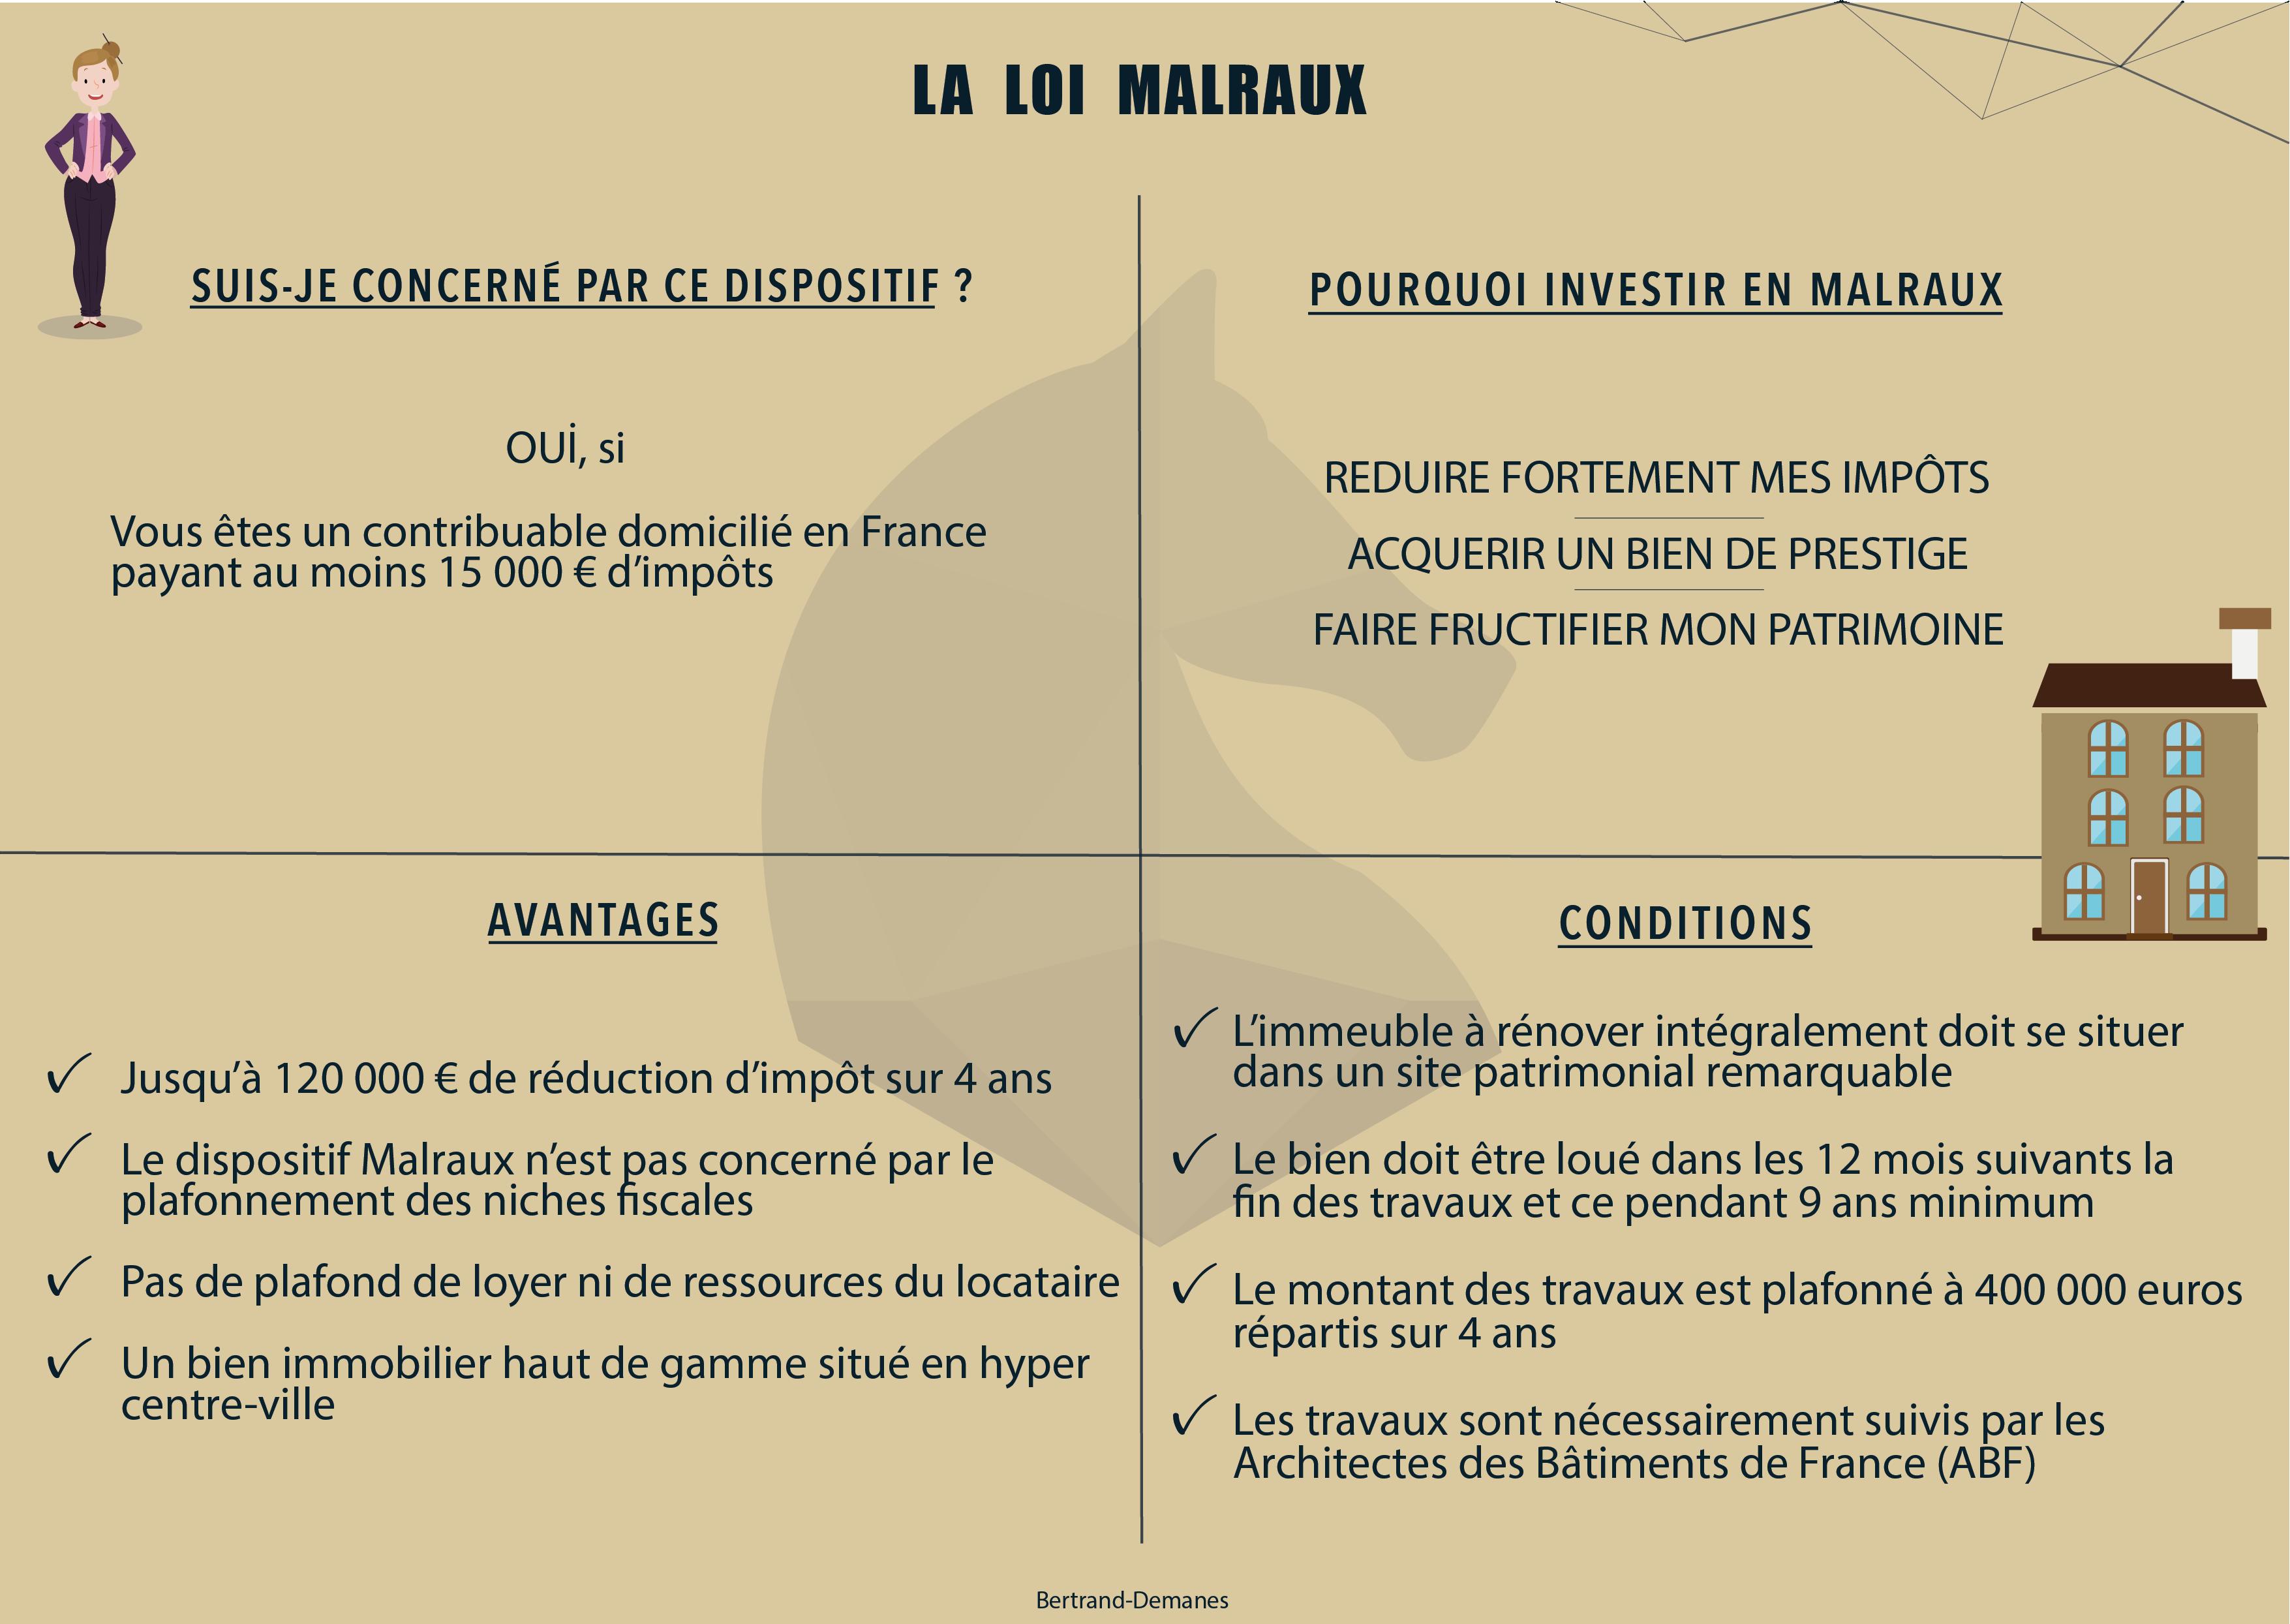 infographie-loi-malraux-rennes-bertrand-demanes